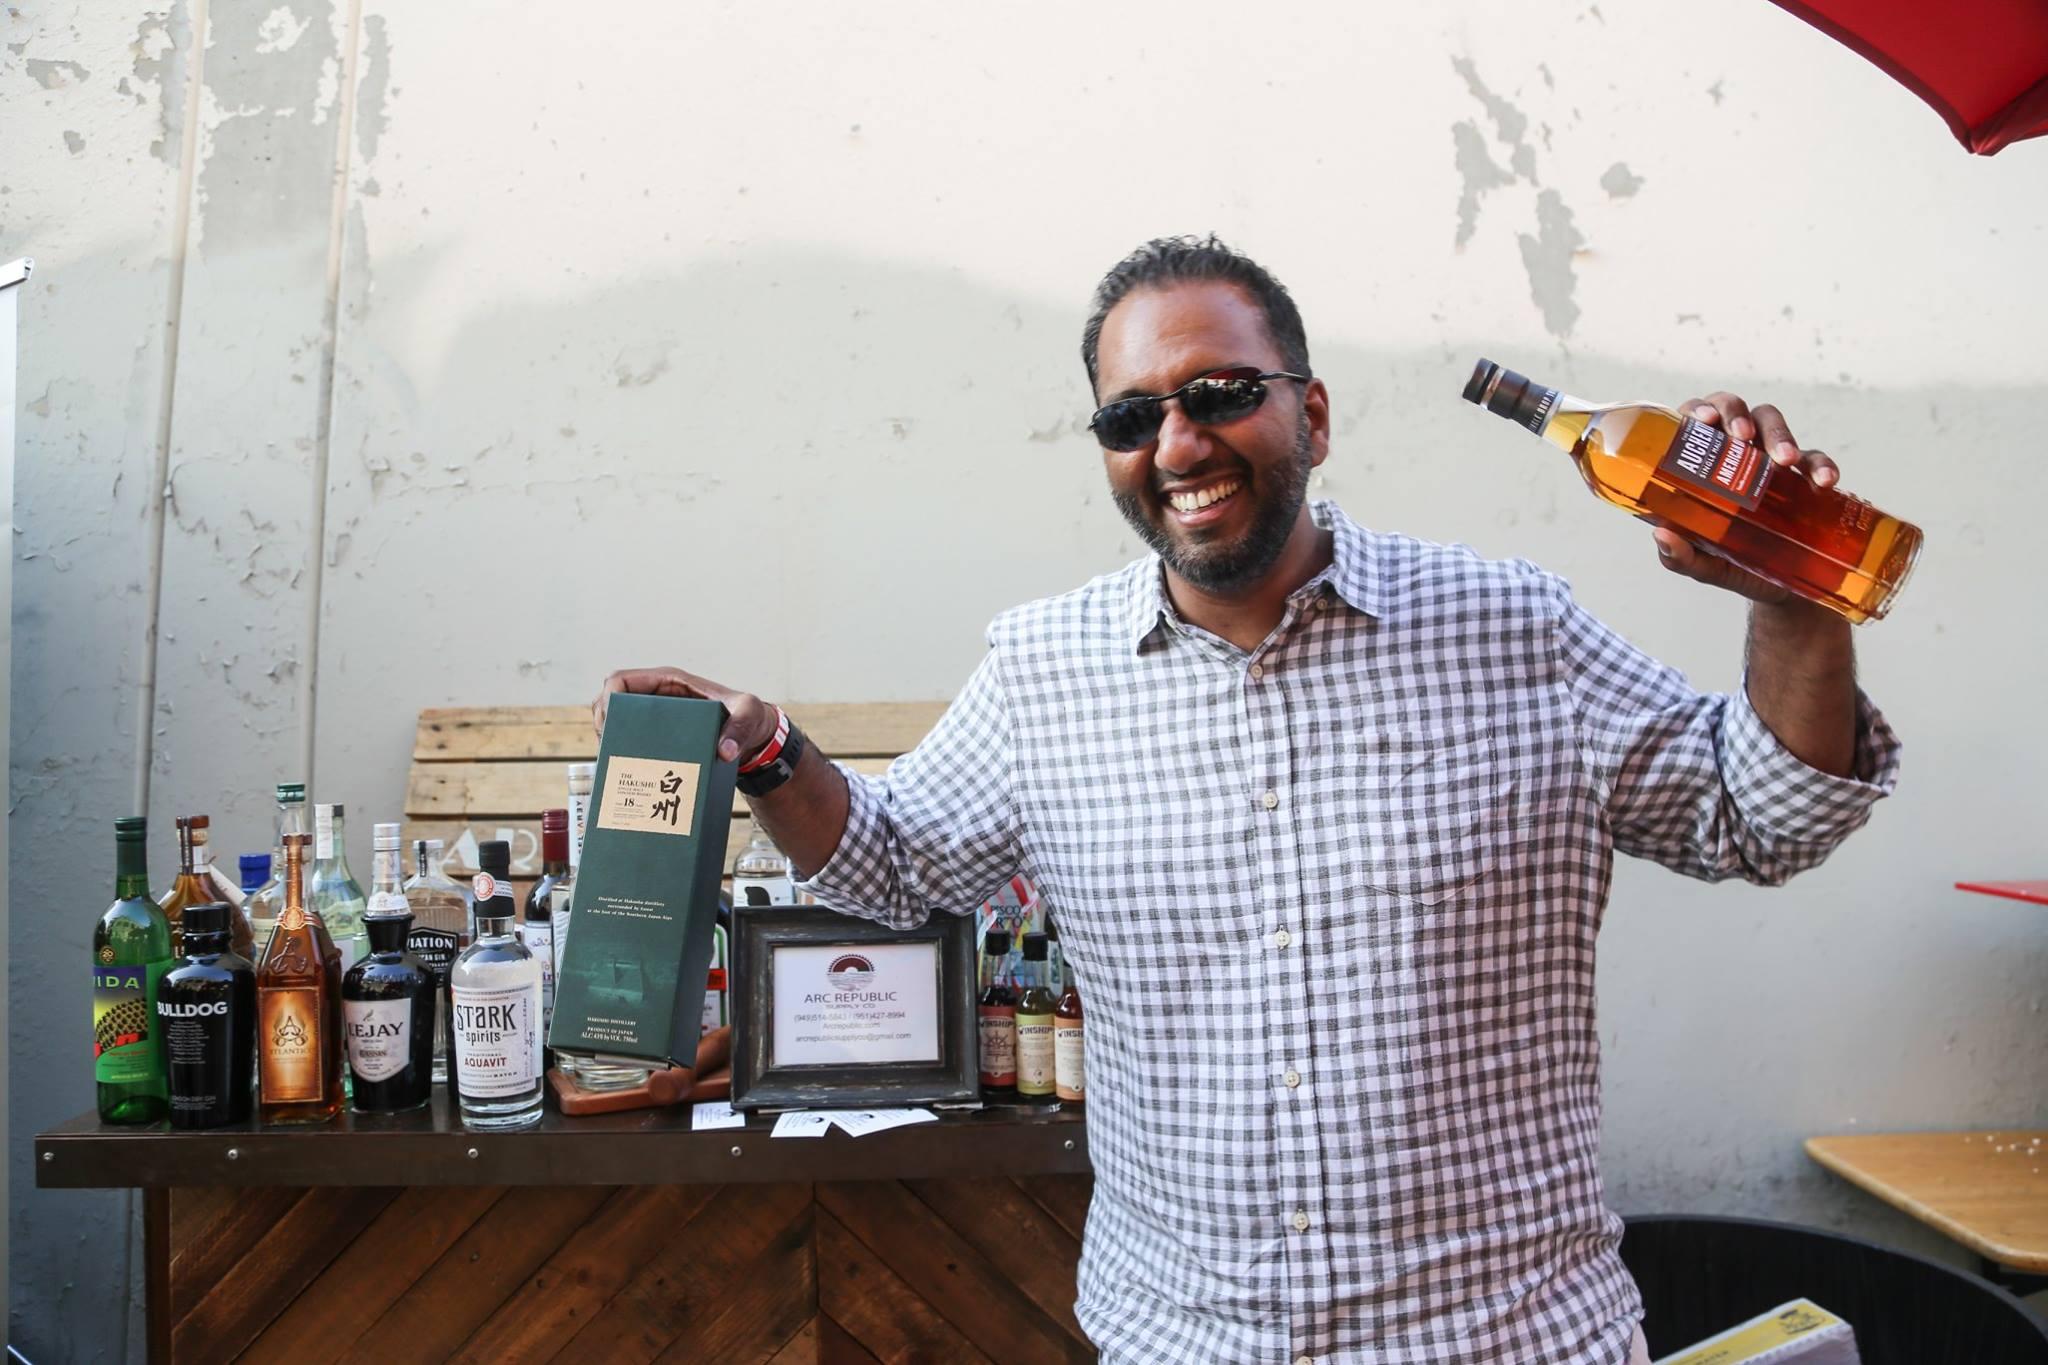 Congrats to Nishant Narayan, who won the Instant Home Bar raffle! | Photo by Eugene Lee